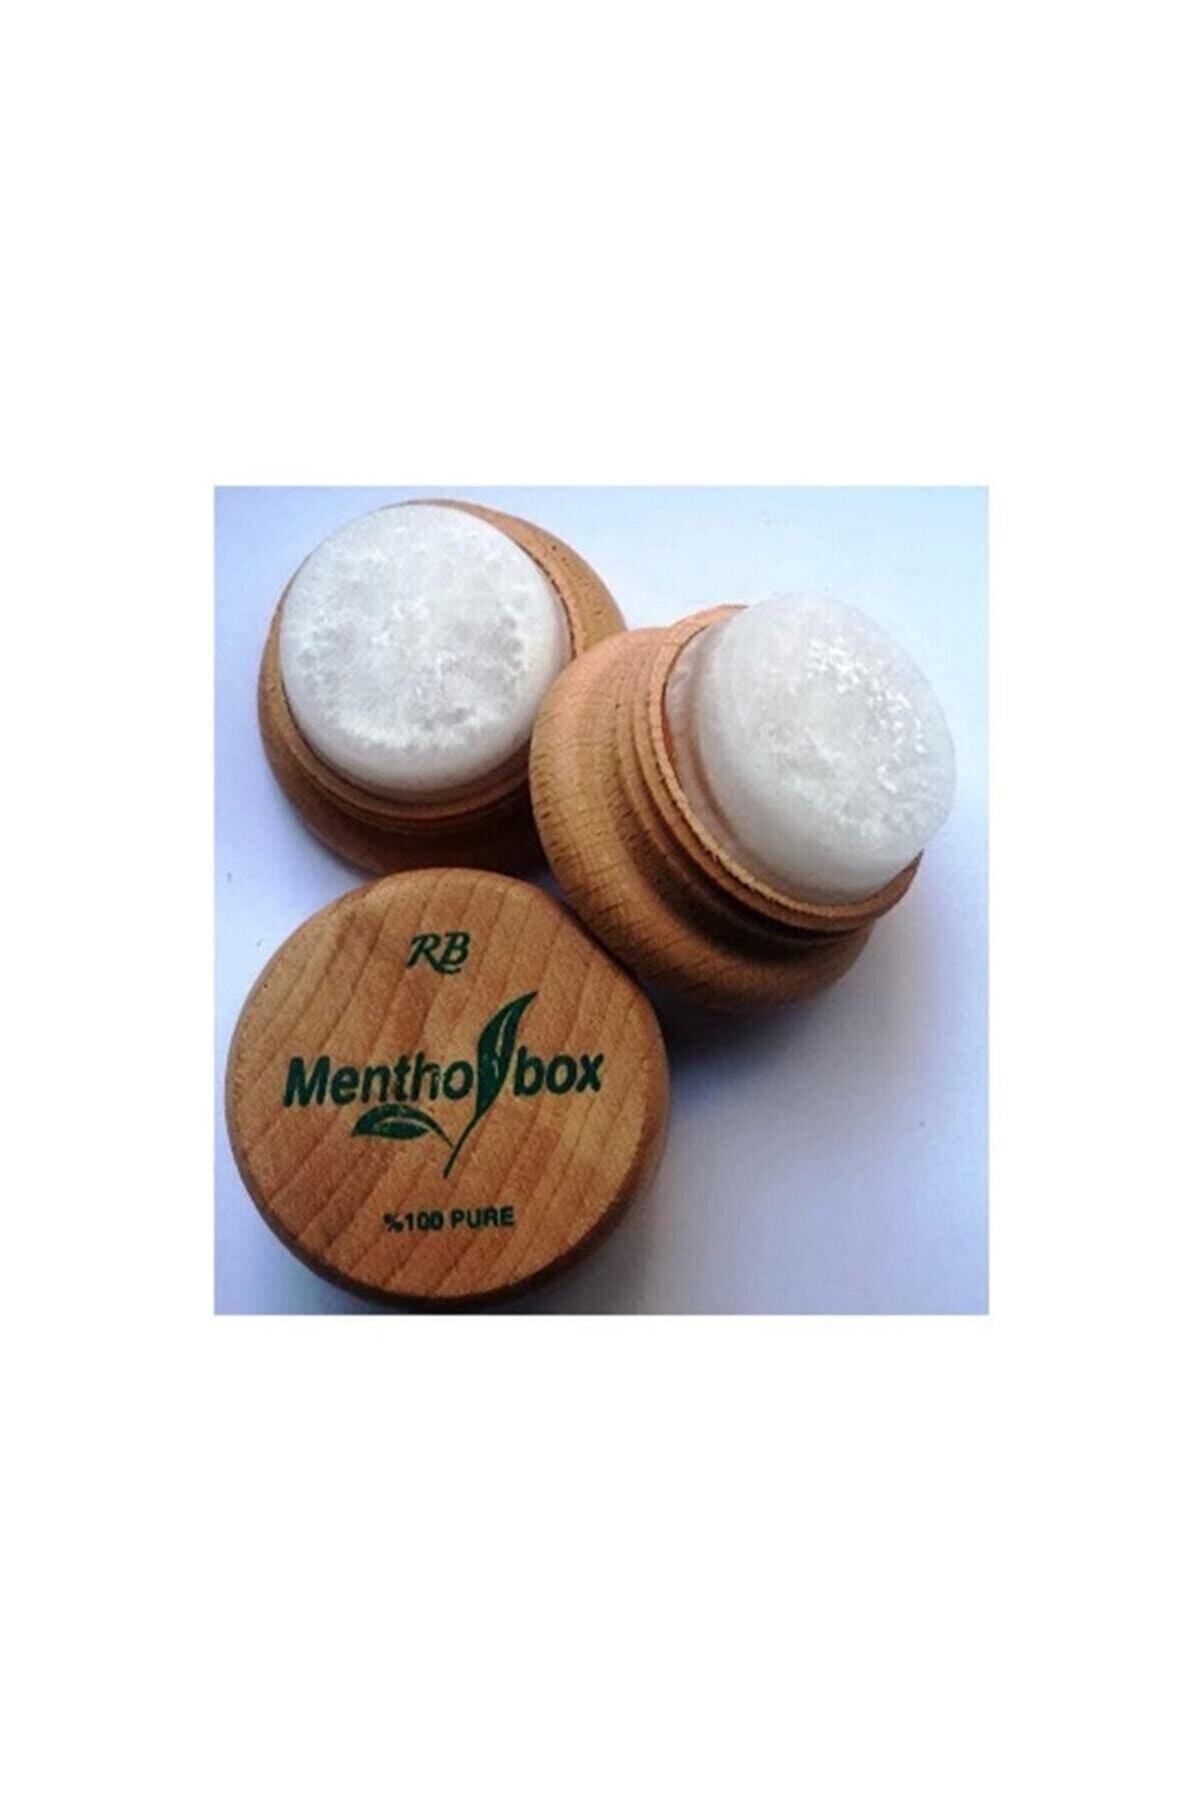 Akkoyun Migren Taşı Menthol Box